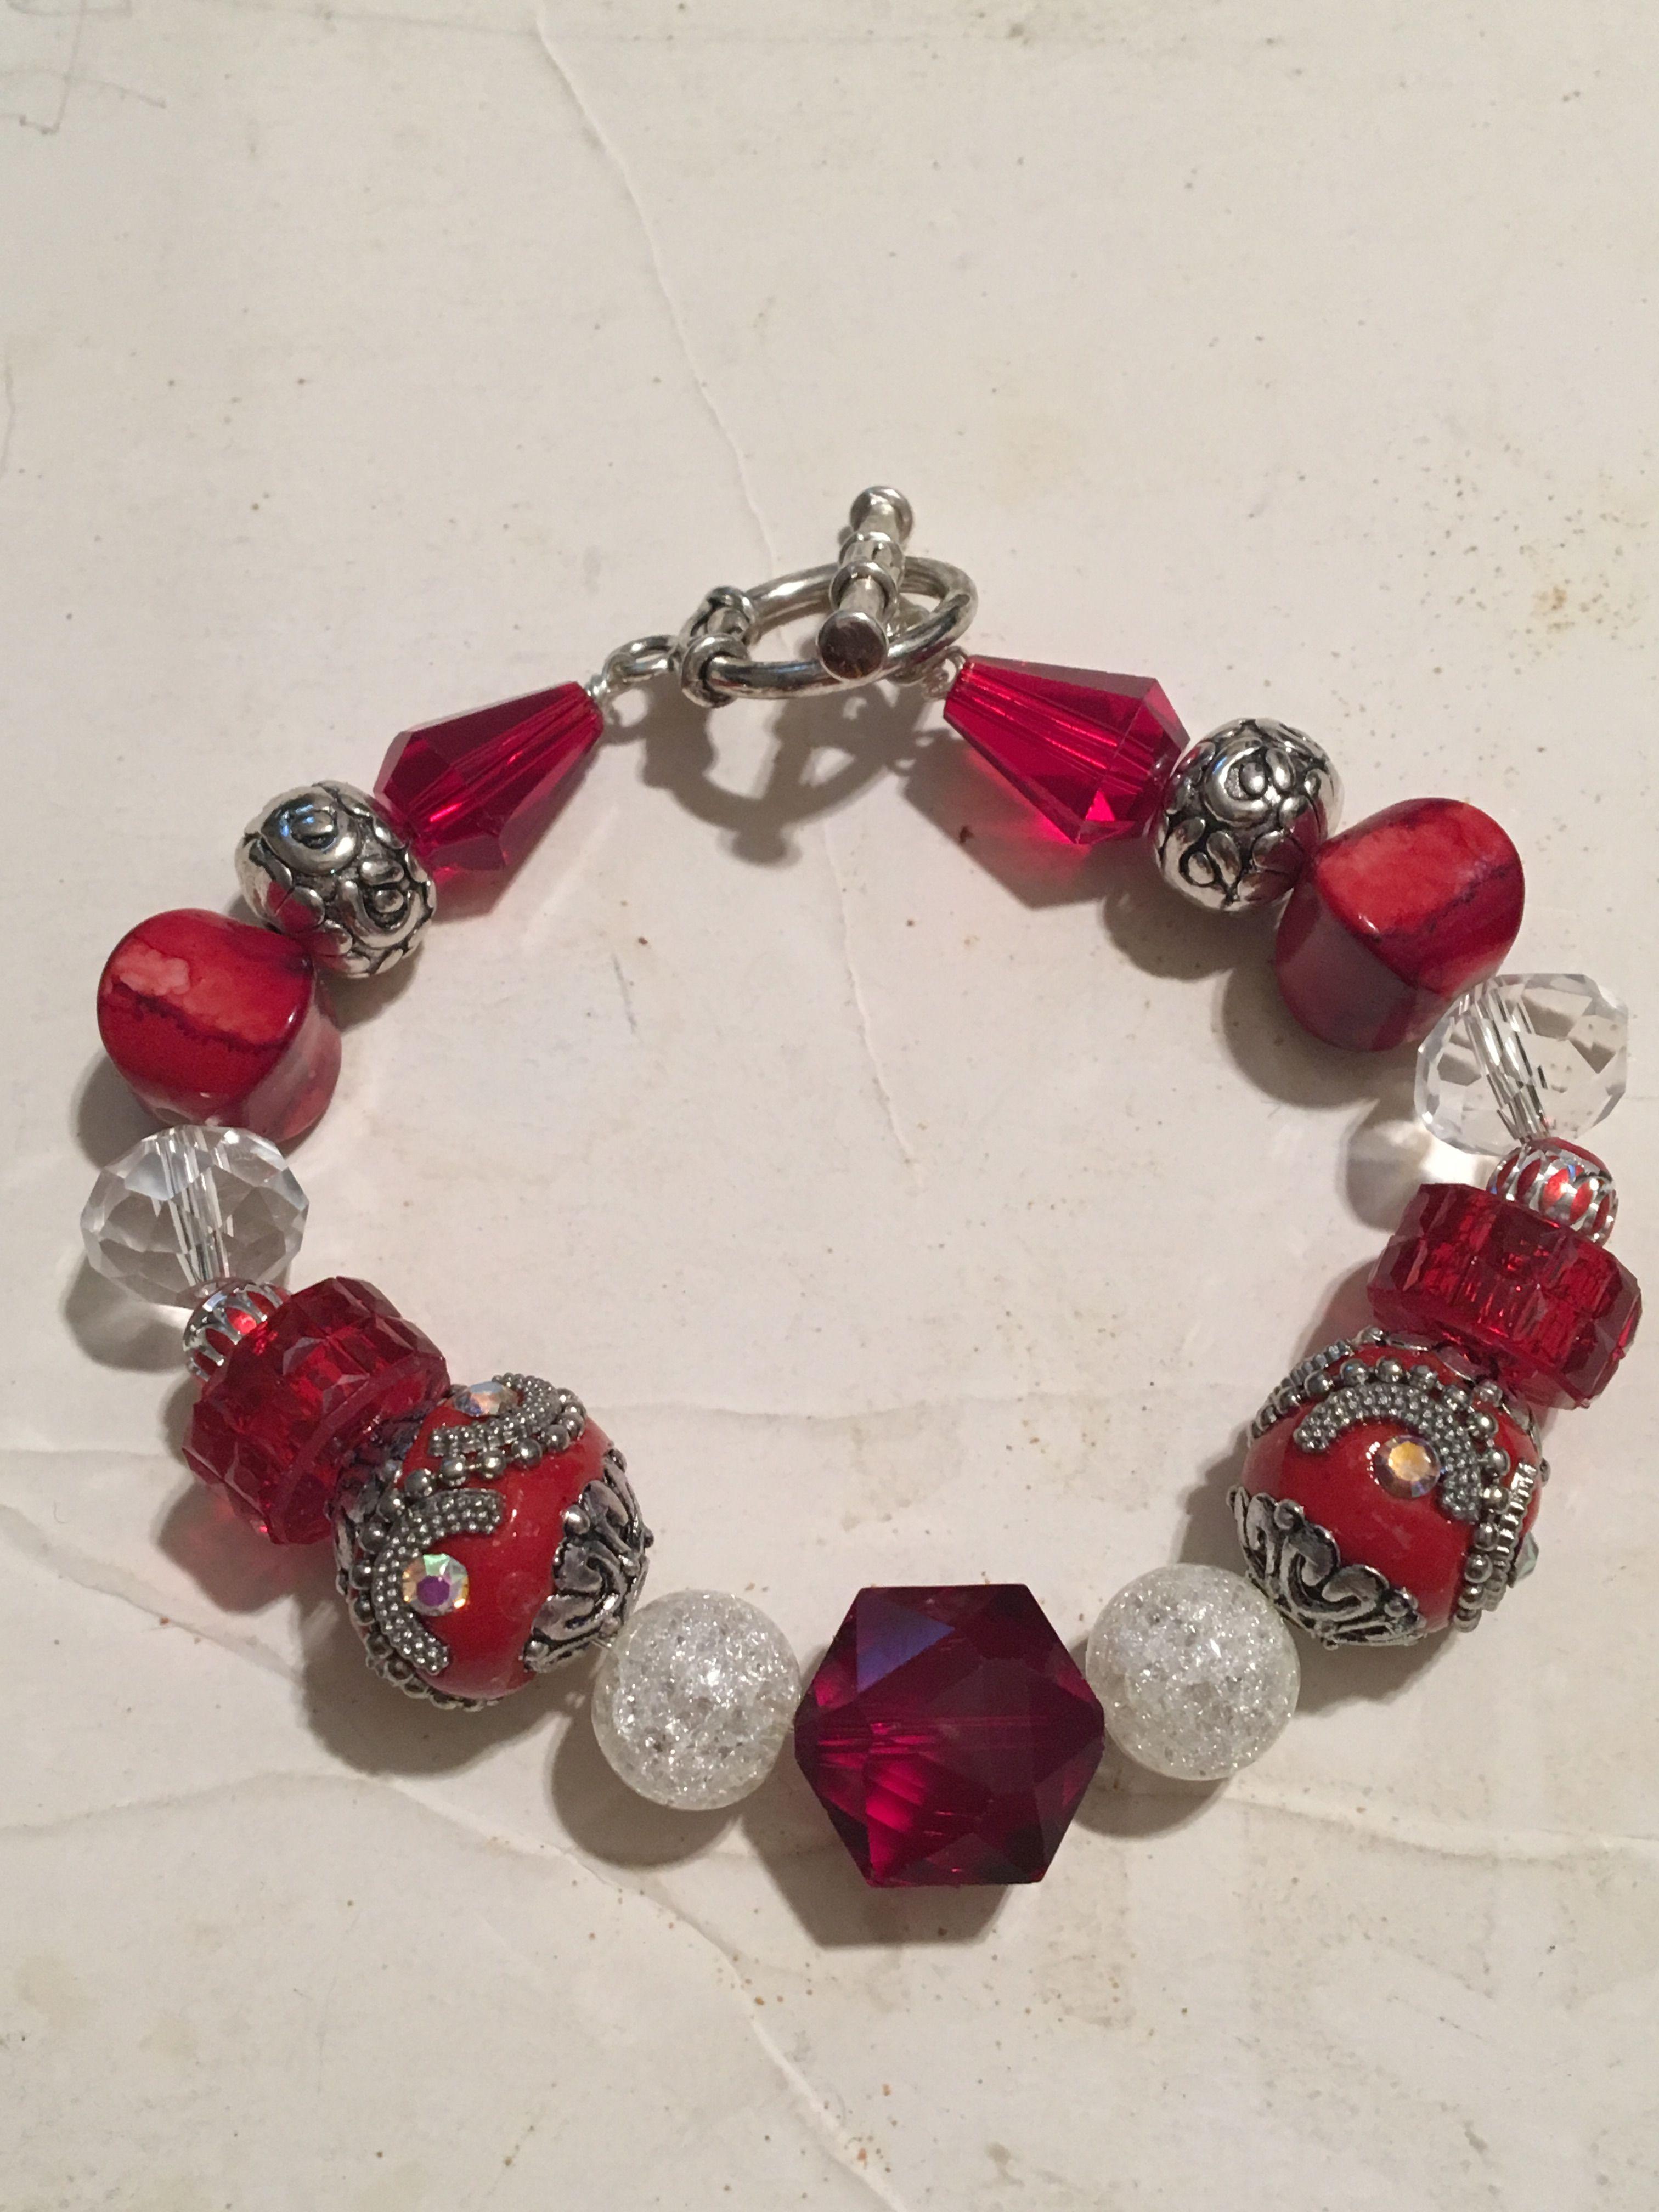 Pin by allison merriweather on shamballa bracelets pinterest